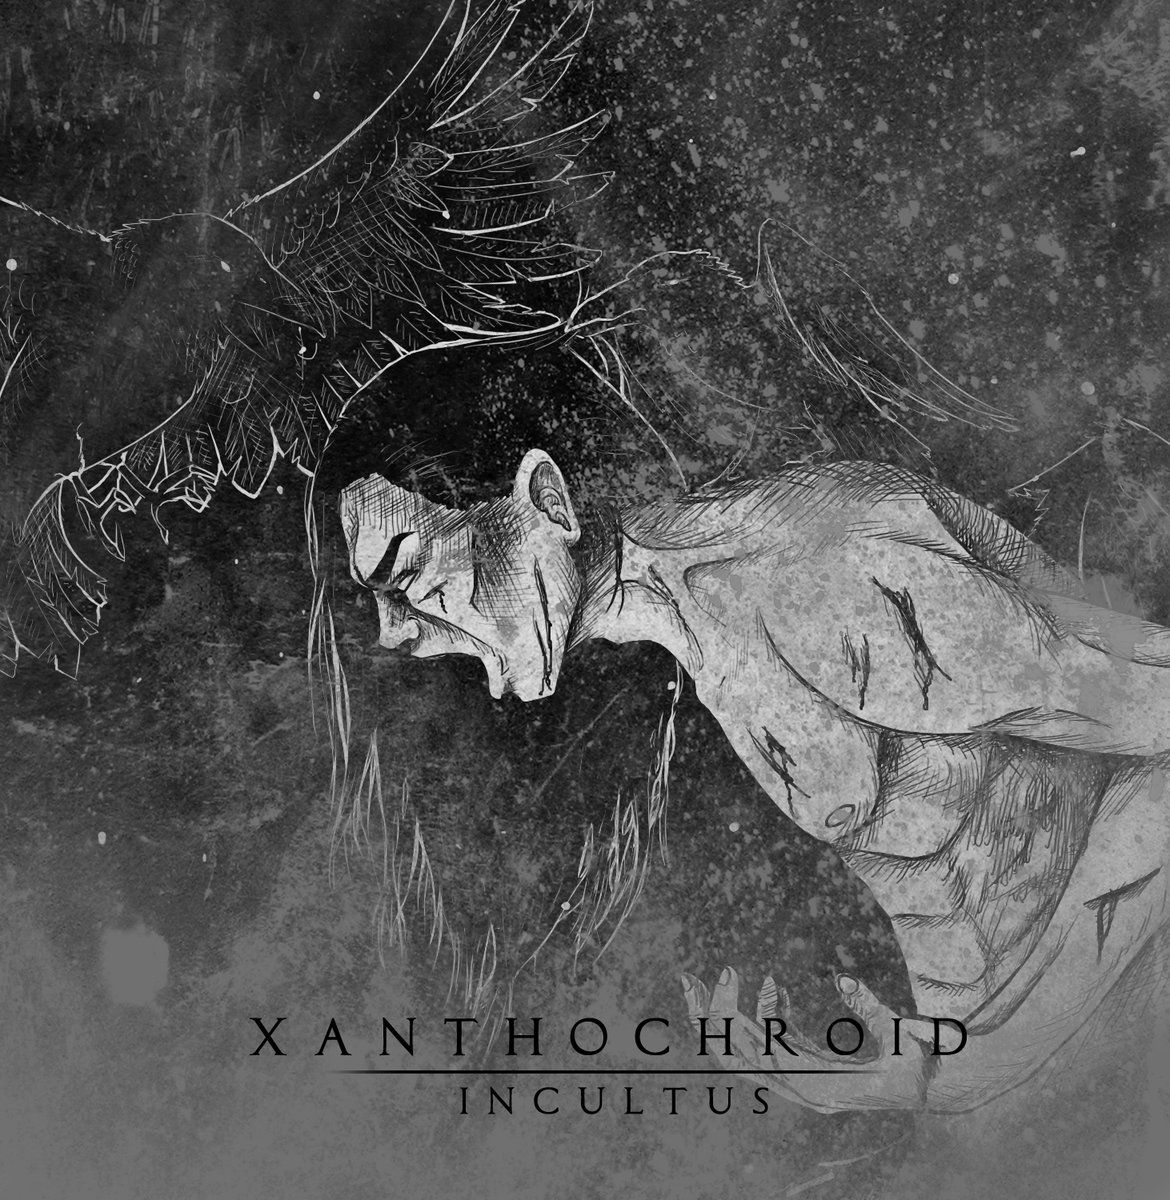 xanthochroid-incultus-ep